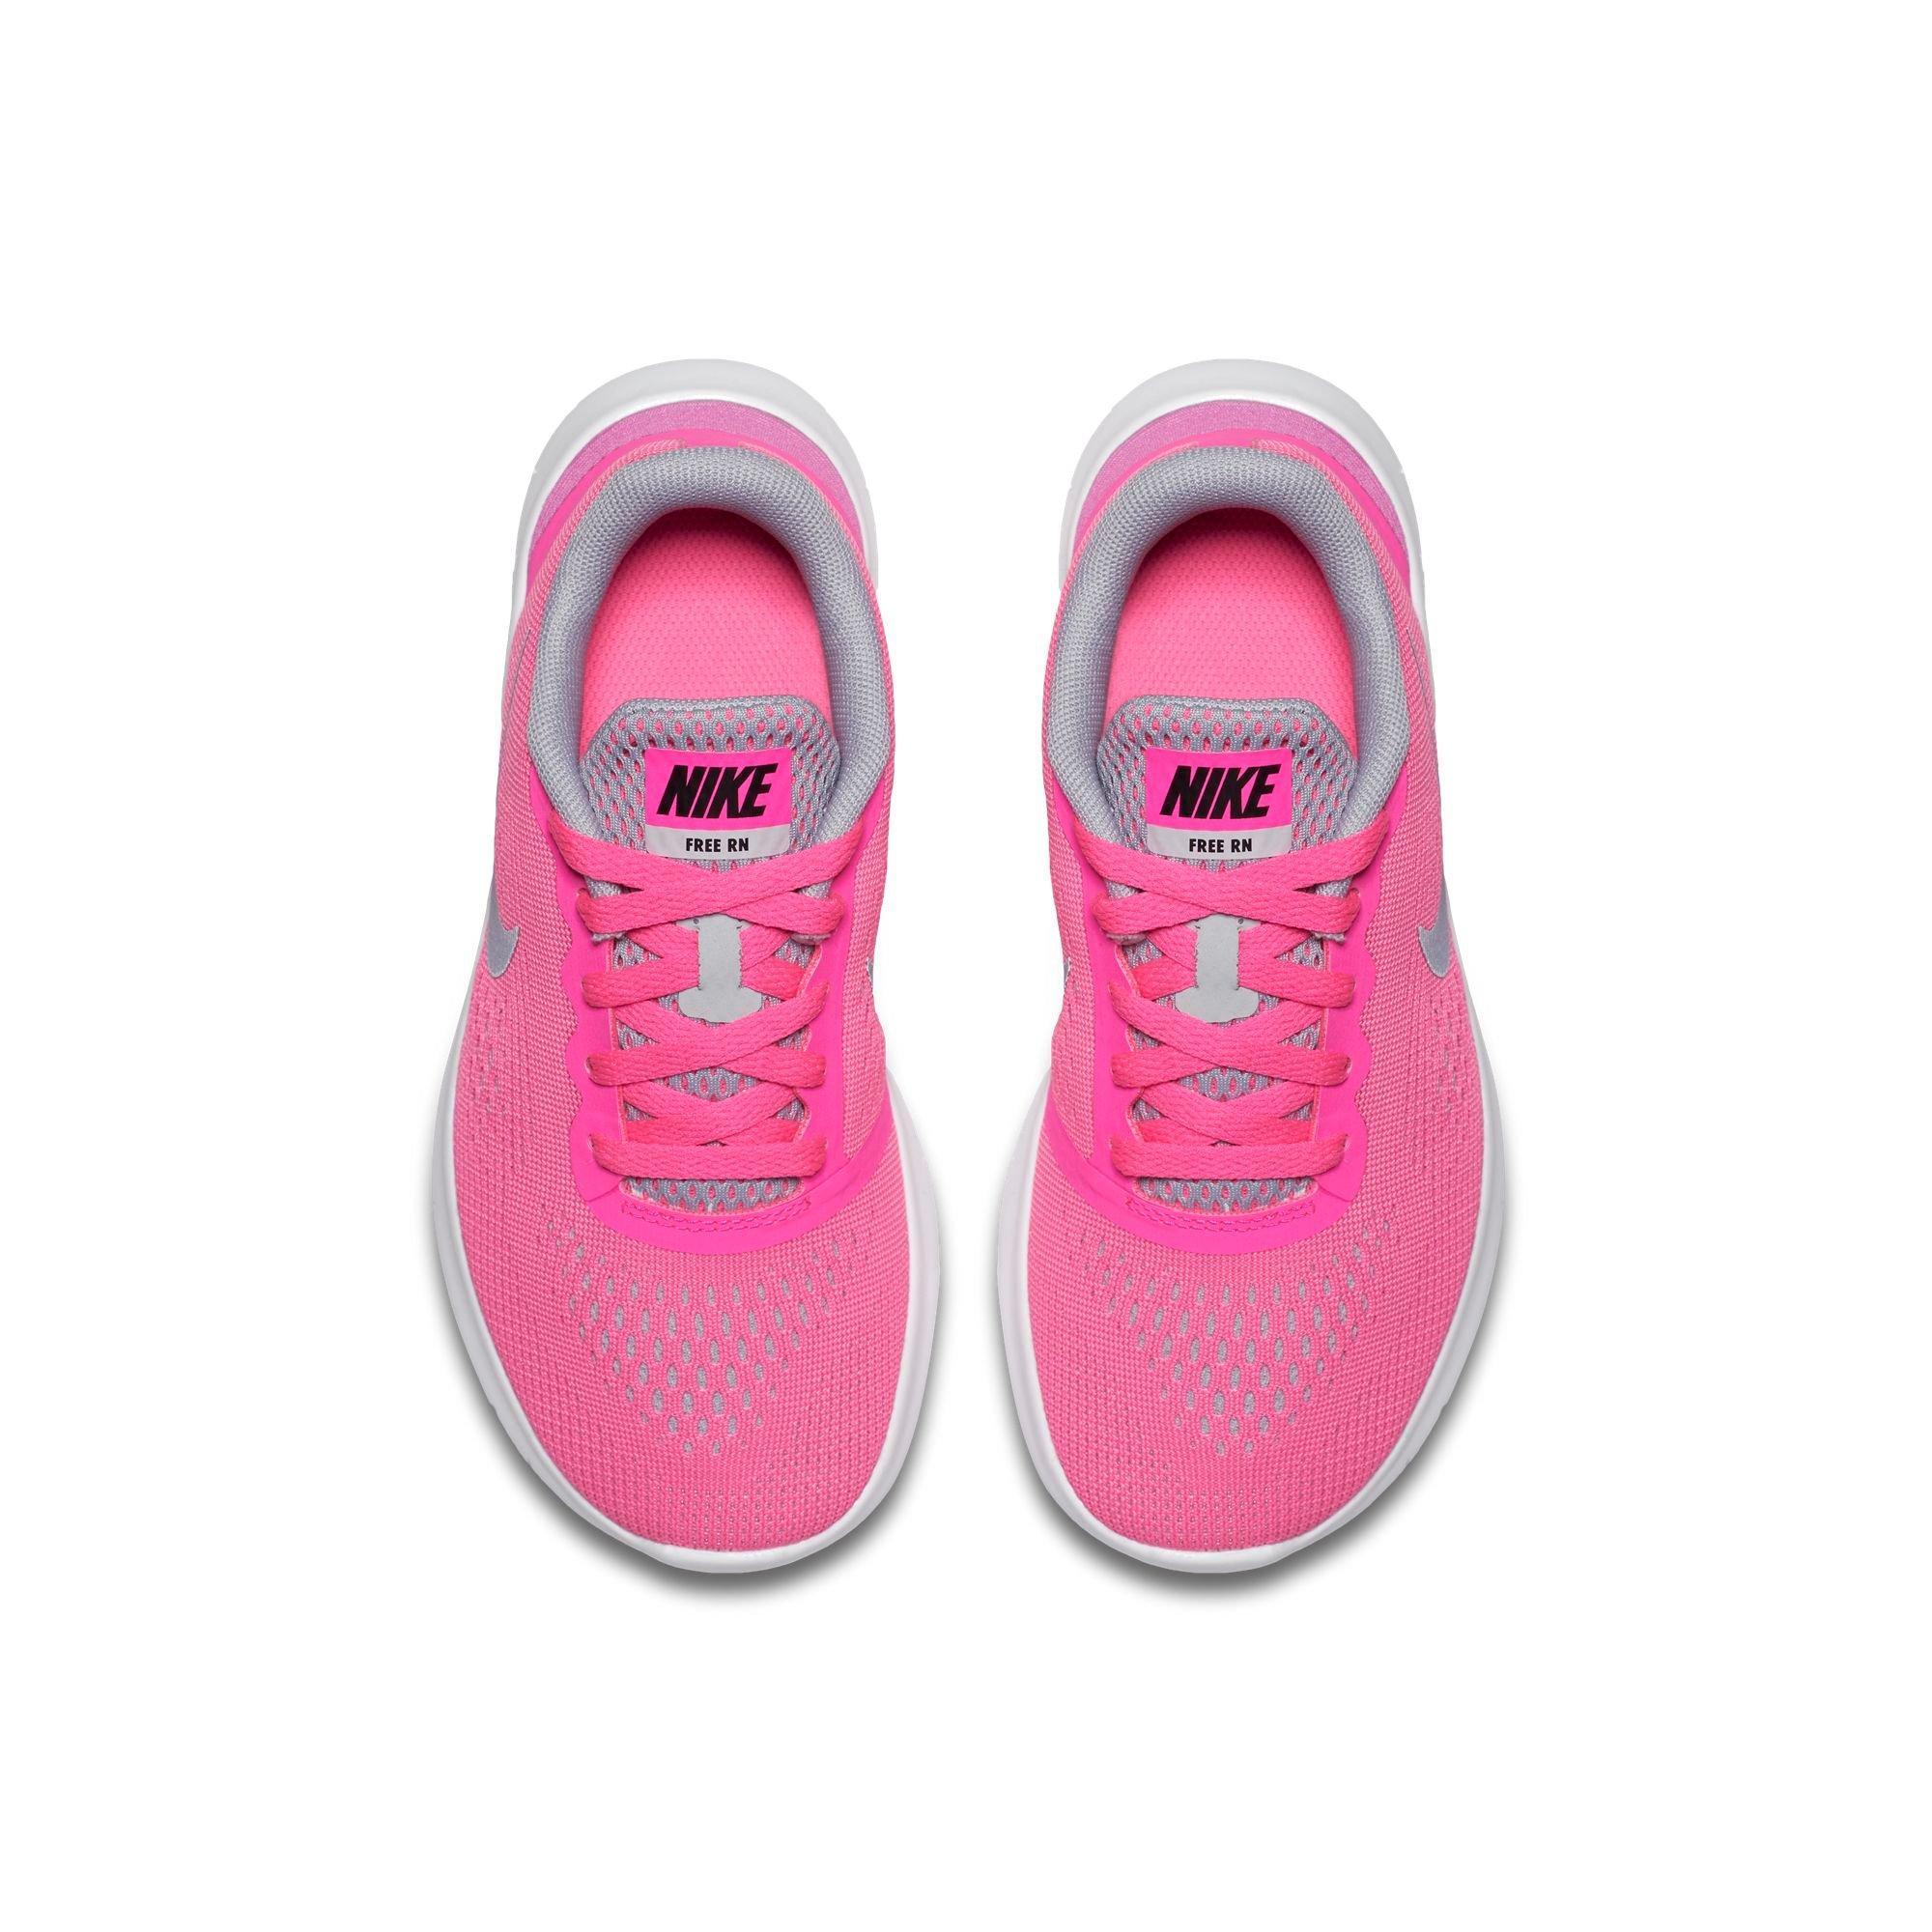 Nike Shocks For Women Cheap Nike Blazer Mid Metric Black For Sale In ... b76075d6a